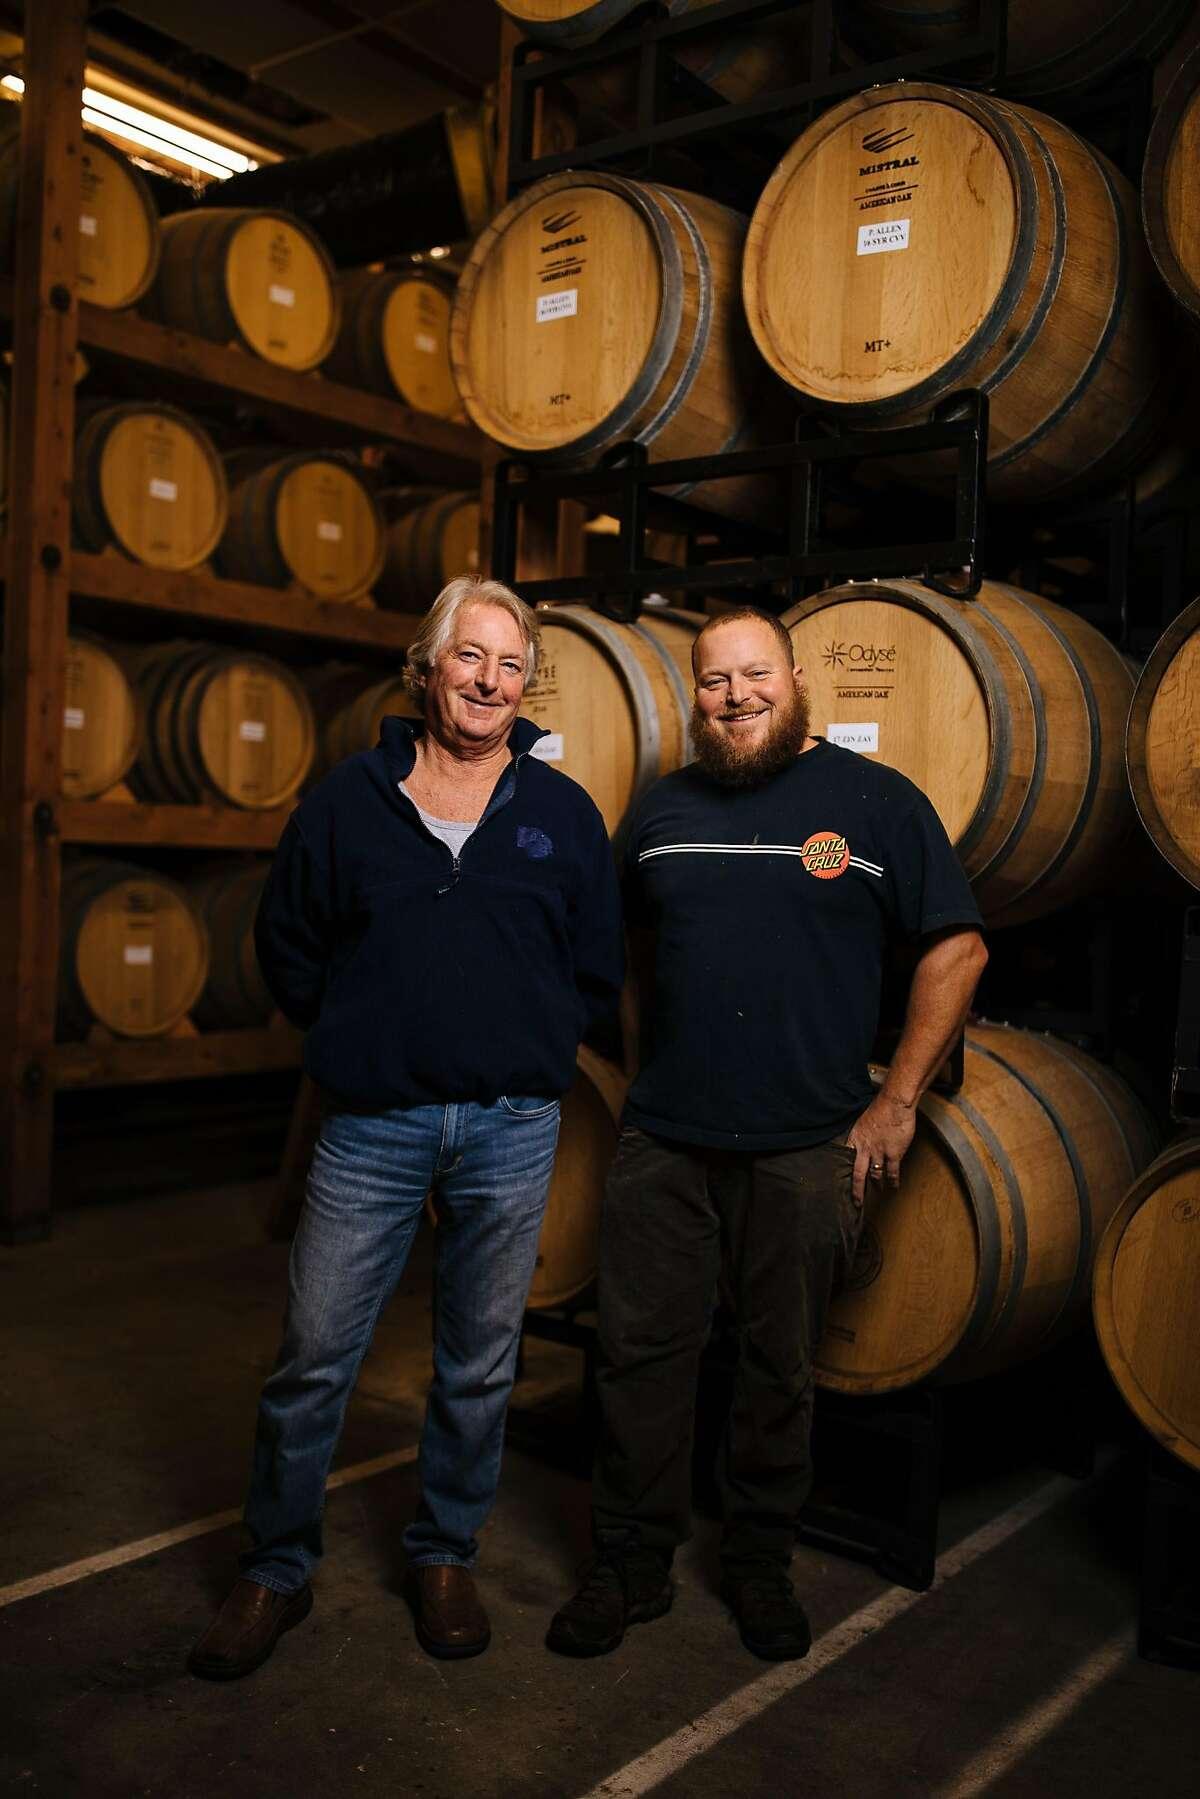 Jim Beauregard, viticulturist, and his son and winemaker, Ryan Beauregard, photographed in the cellar of Beauregard Vineyards in Santa Cruz, Calif. Friday, December 1, 2017.